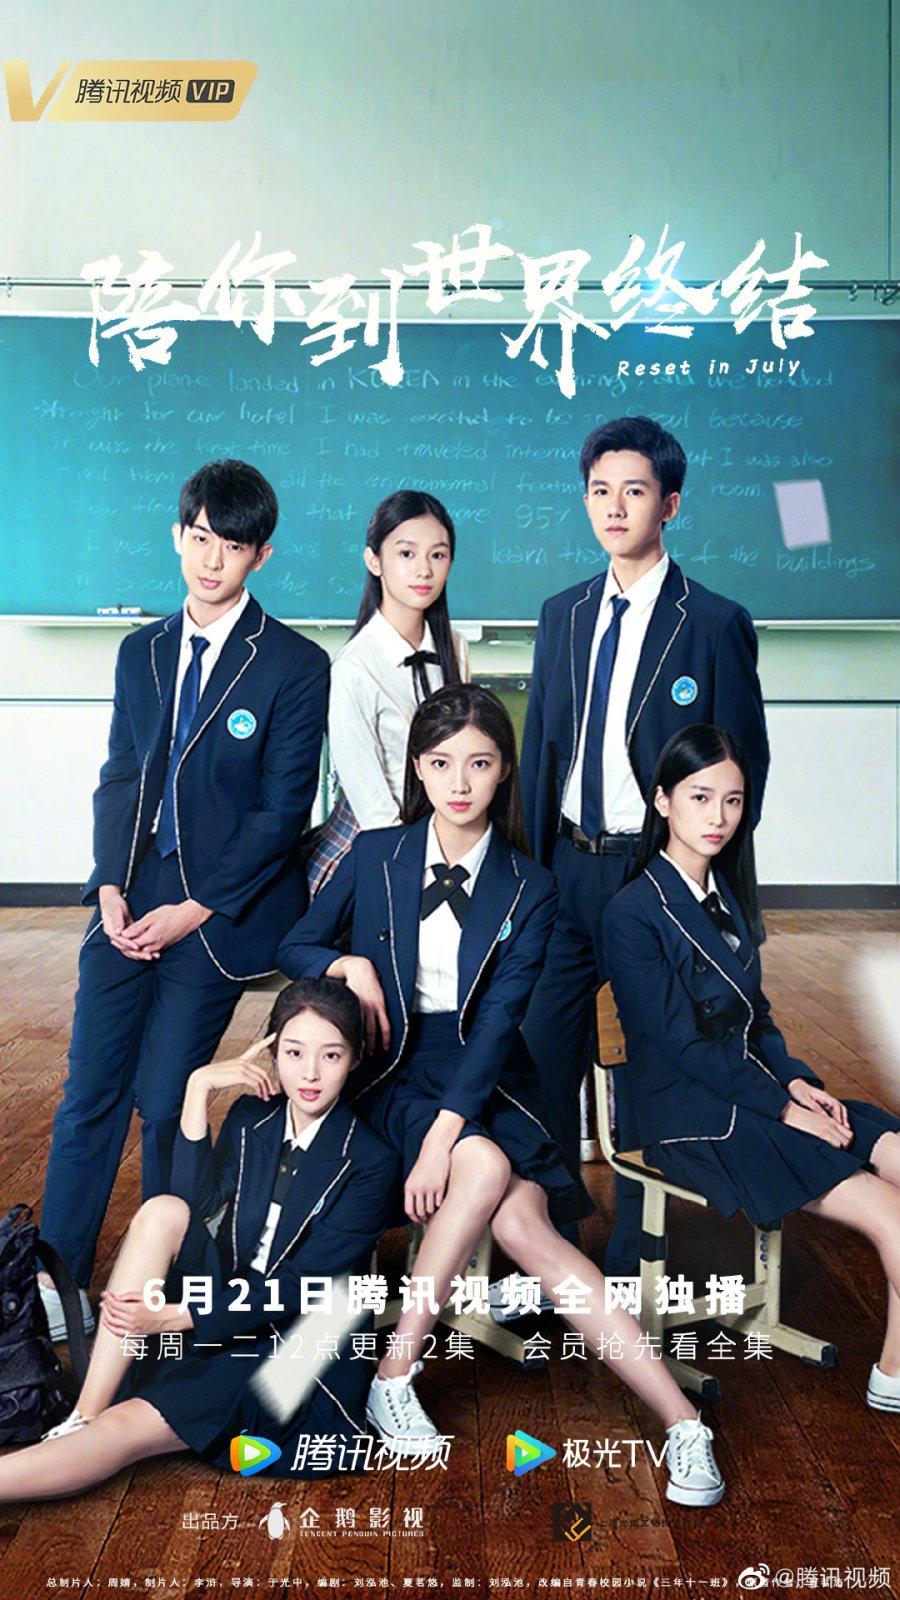 Reset in July Drama China (2021) : Sinopsis dan Review